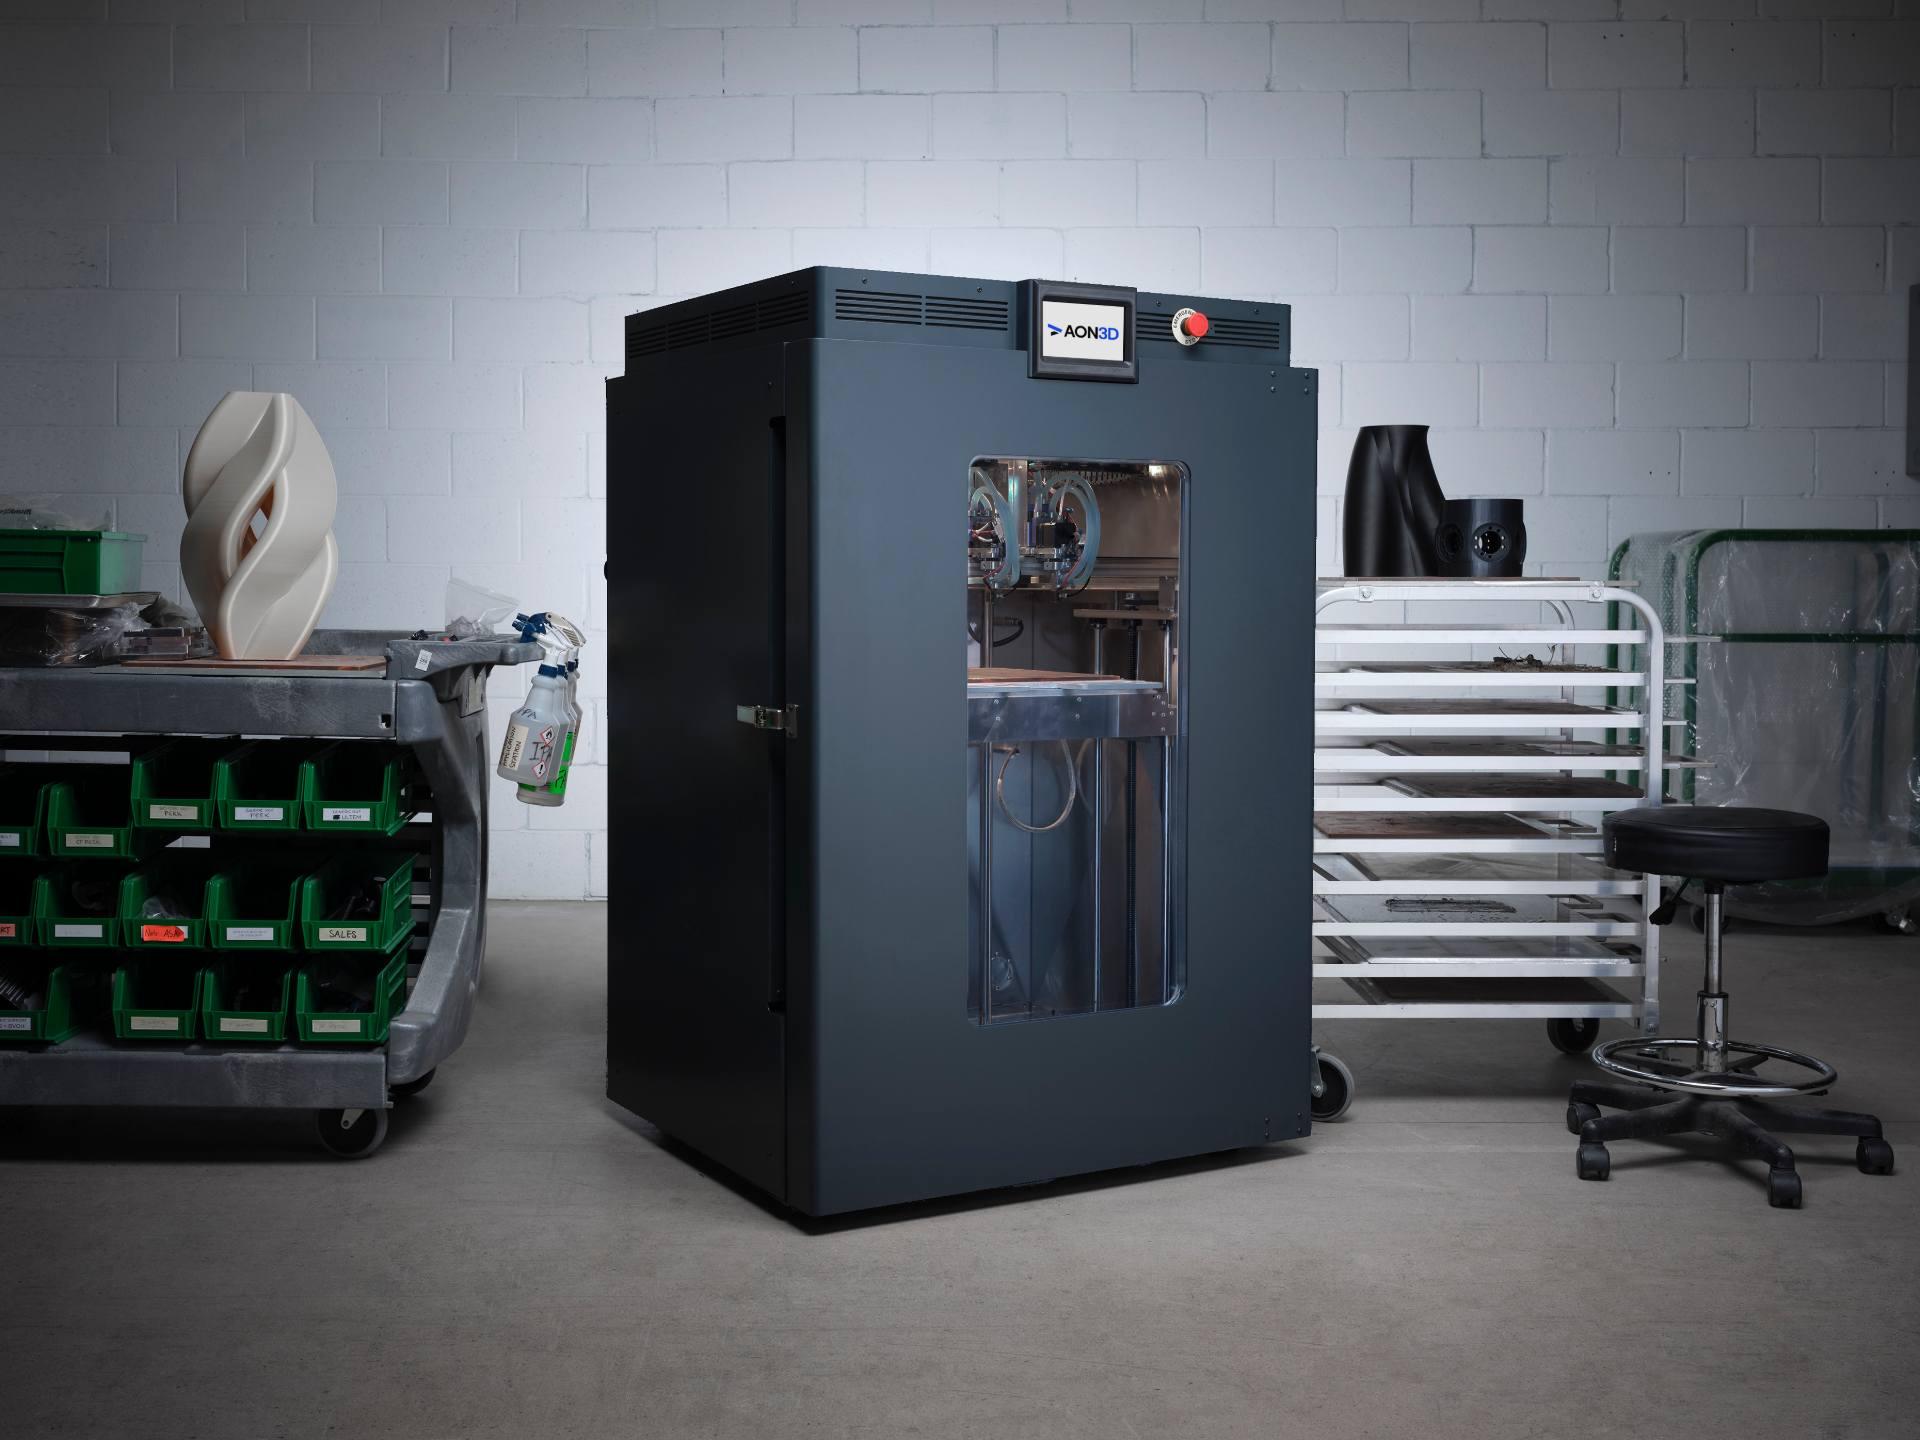 AON-M2 2020 3D-Drucker